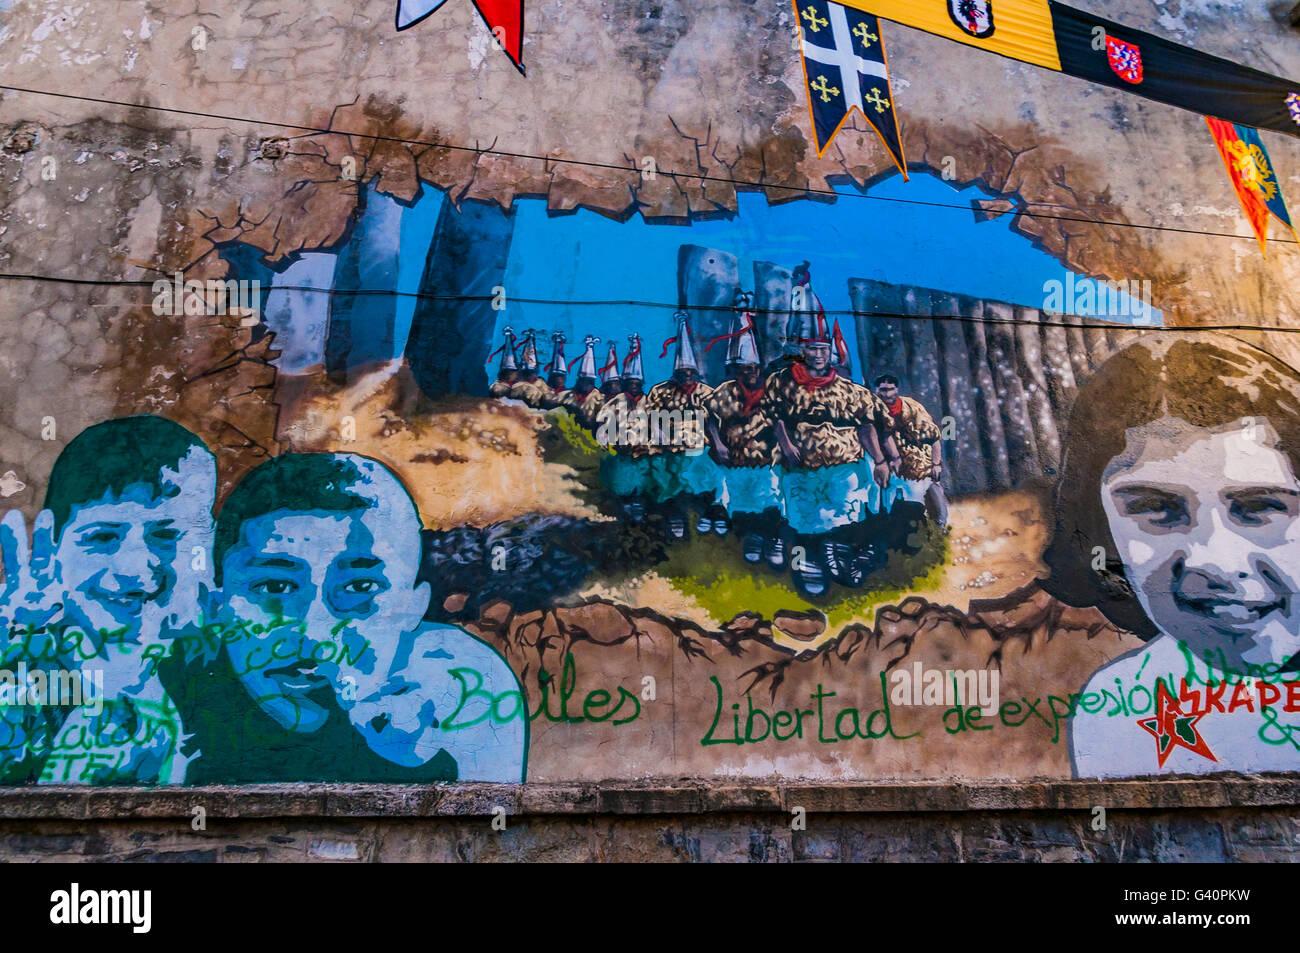 Wandbild Route von Vitoria. Vitoria-Gasteiz, Álava, Baskisches Land, Spanien, Europa Stockbild